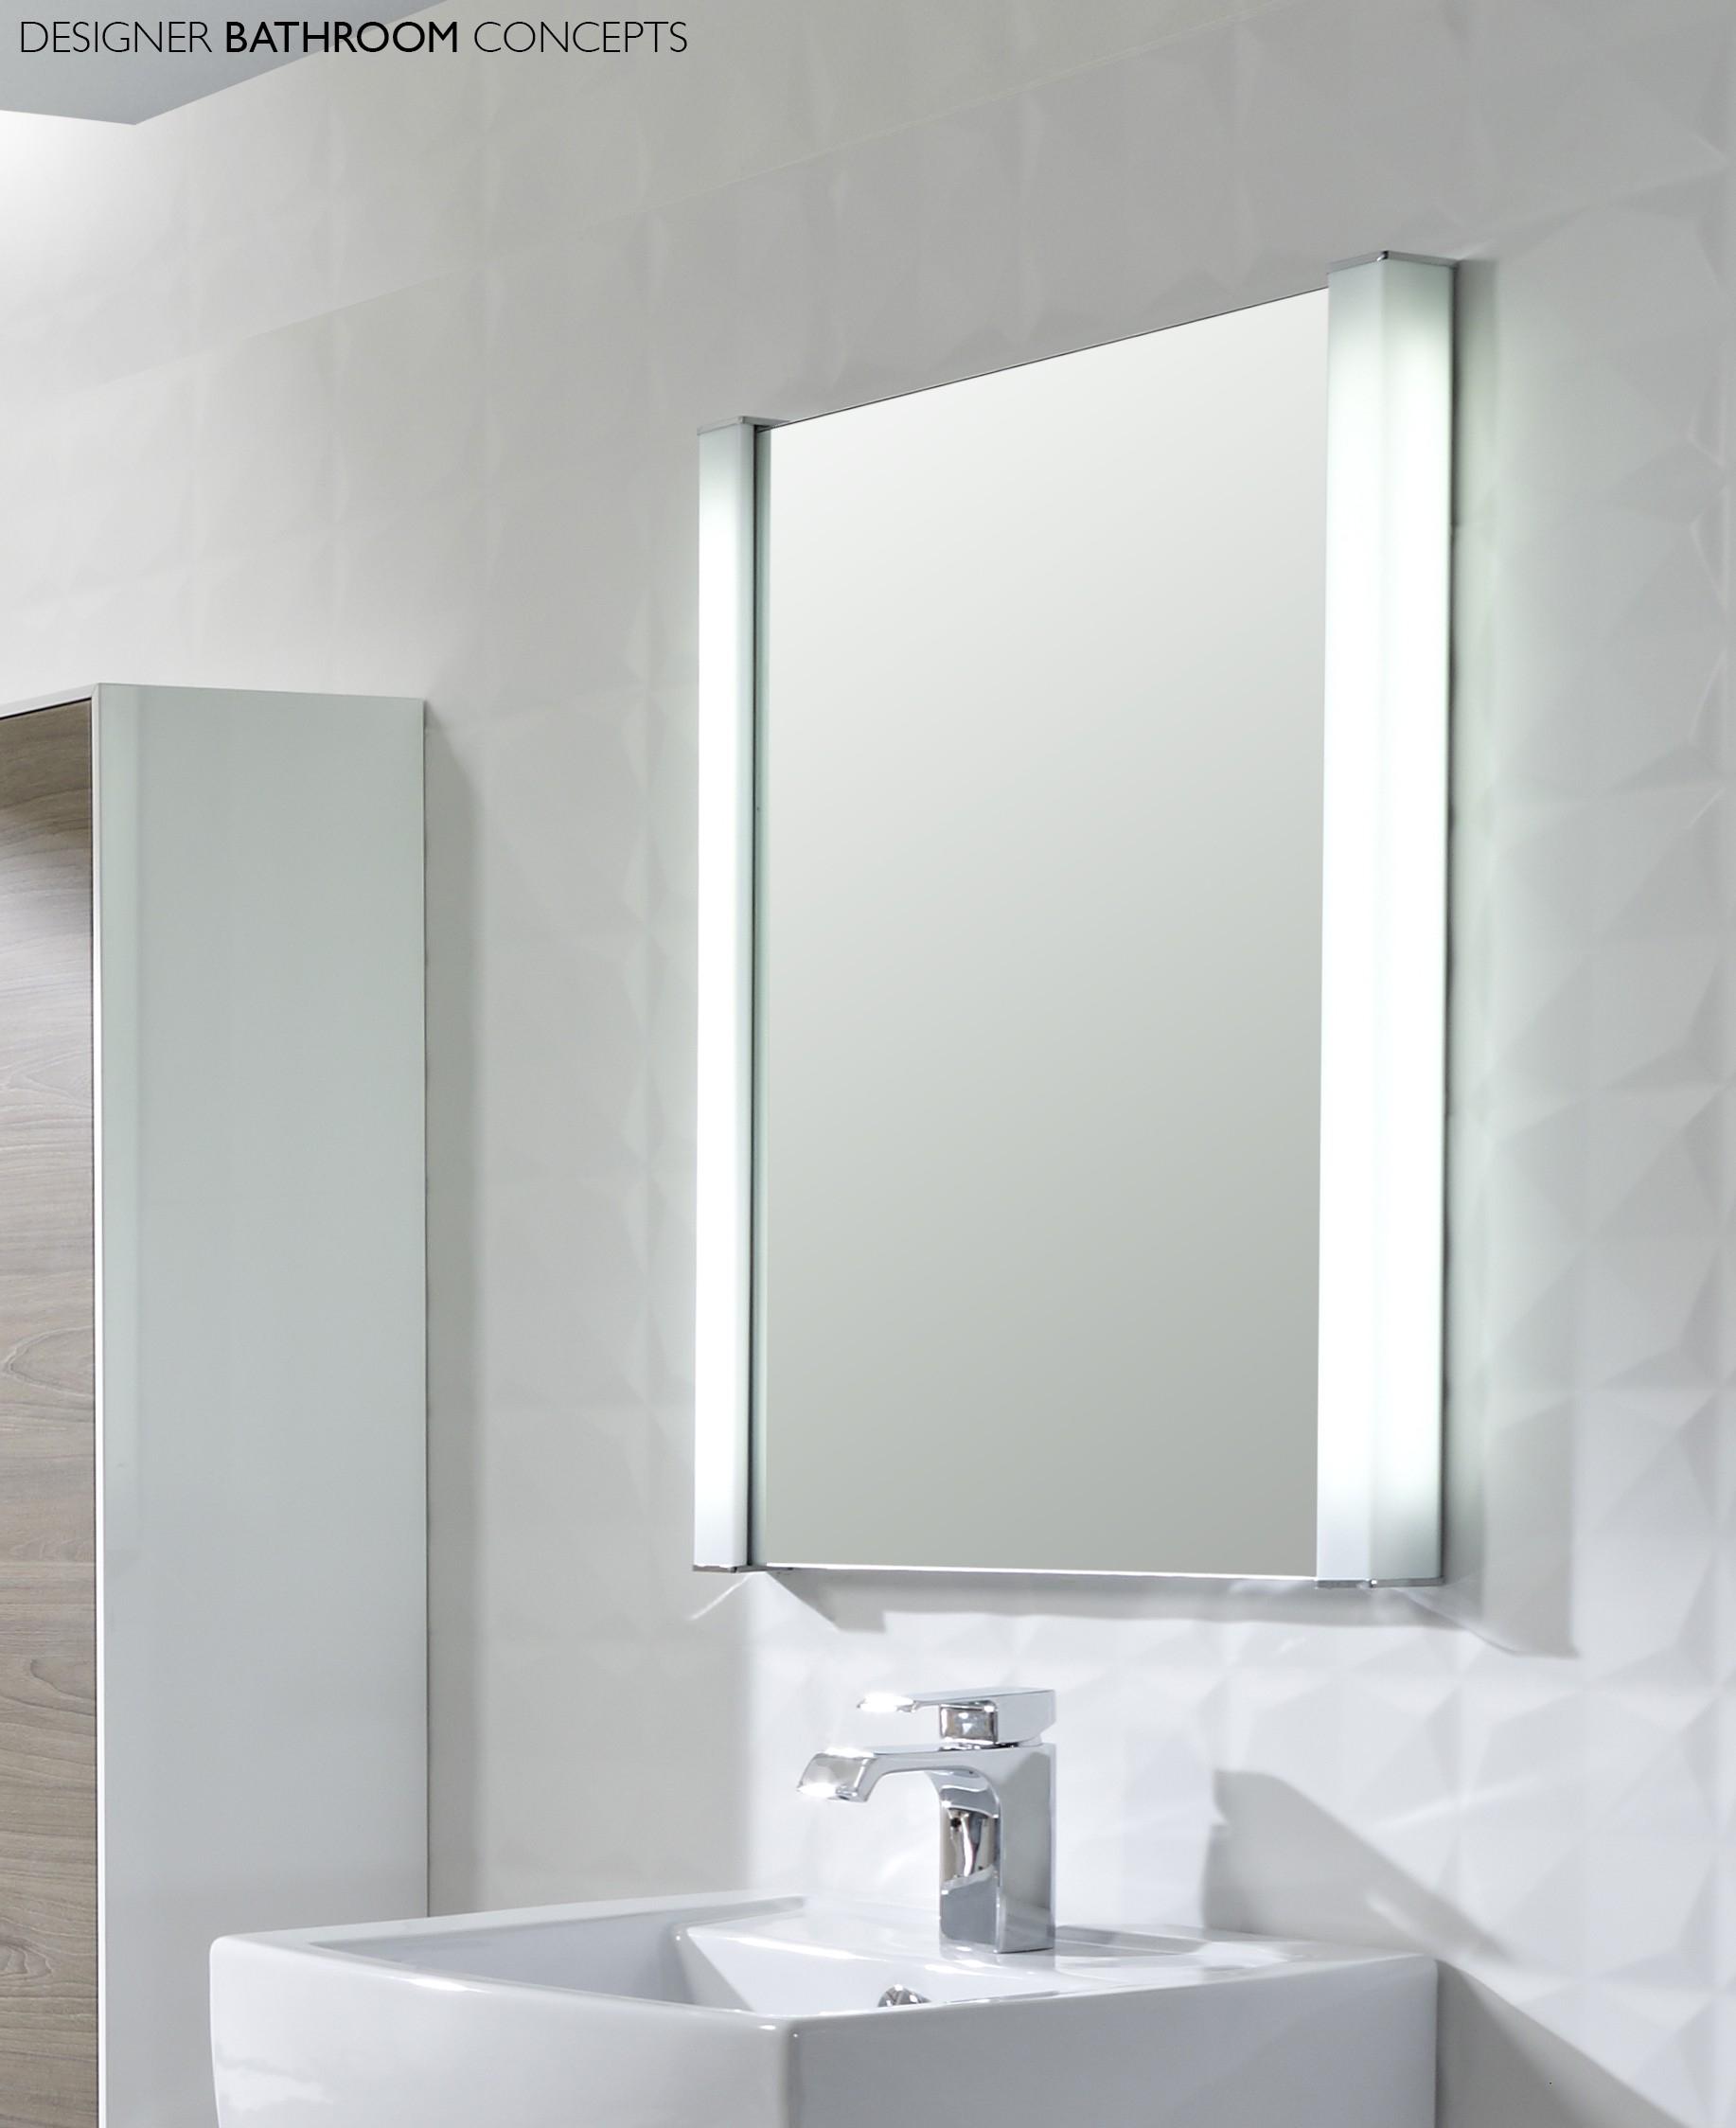 Led Illuminated Bathroom Mirror With Shelf